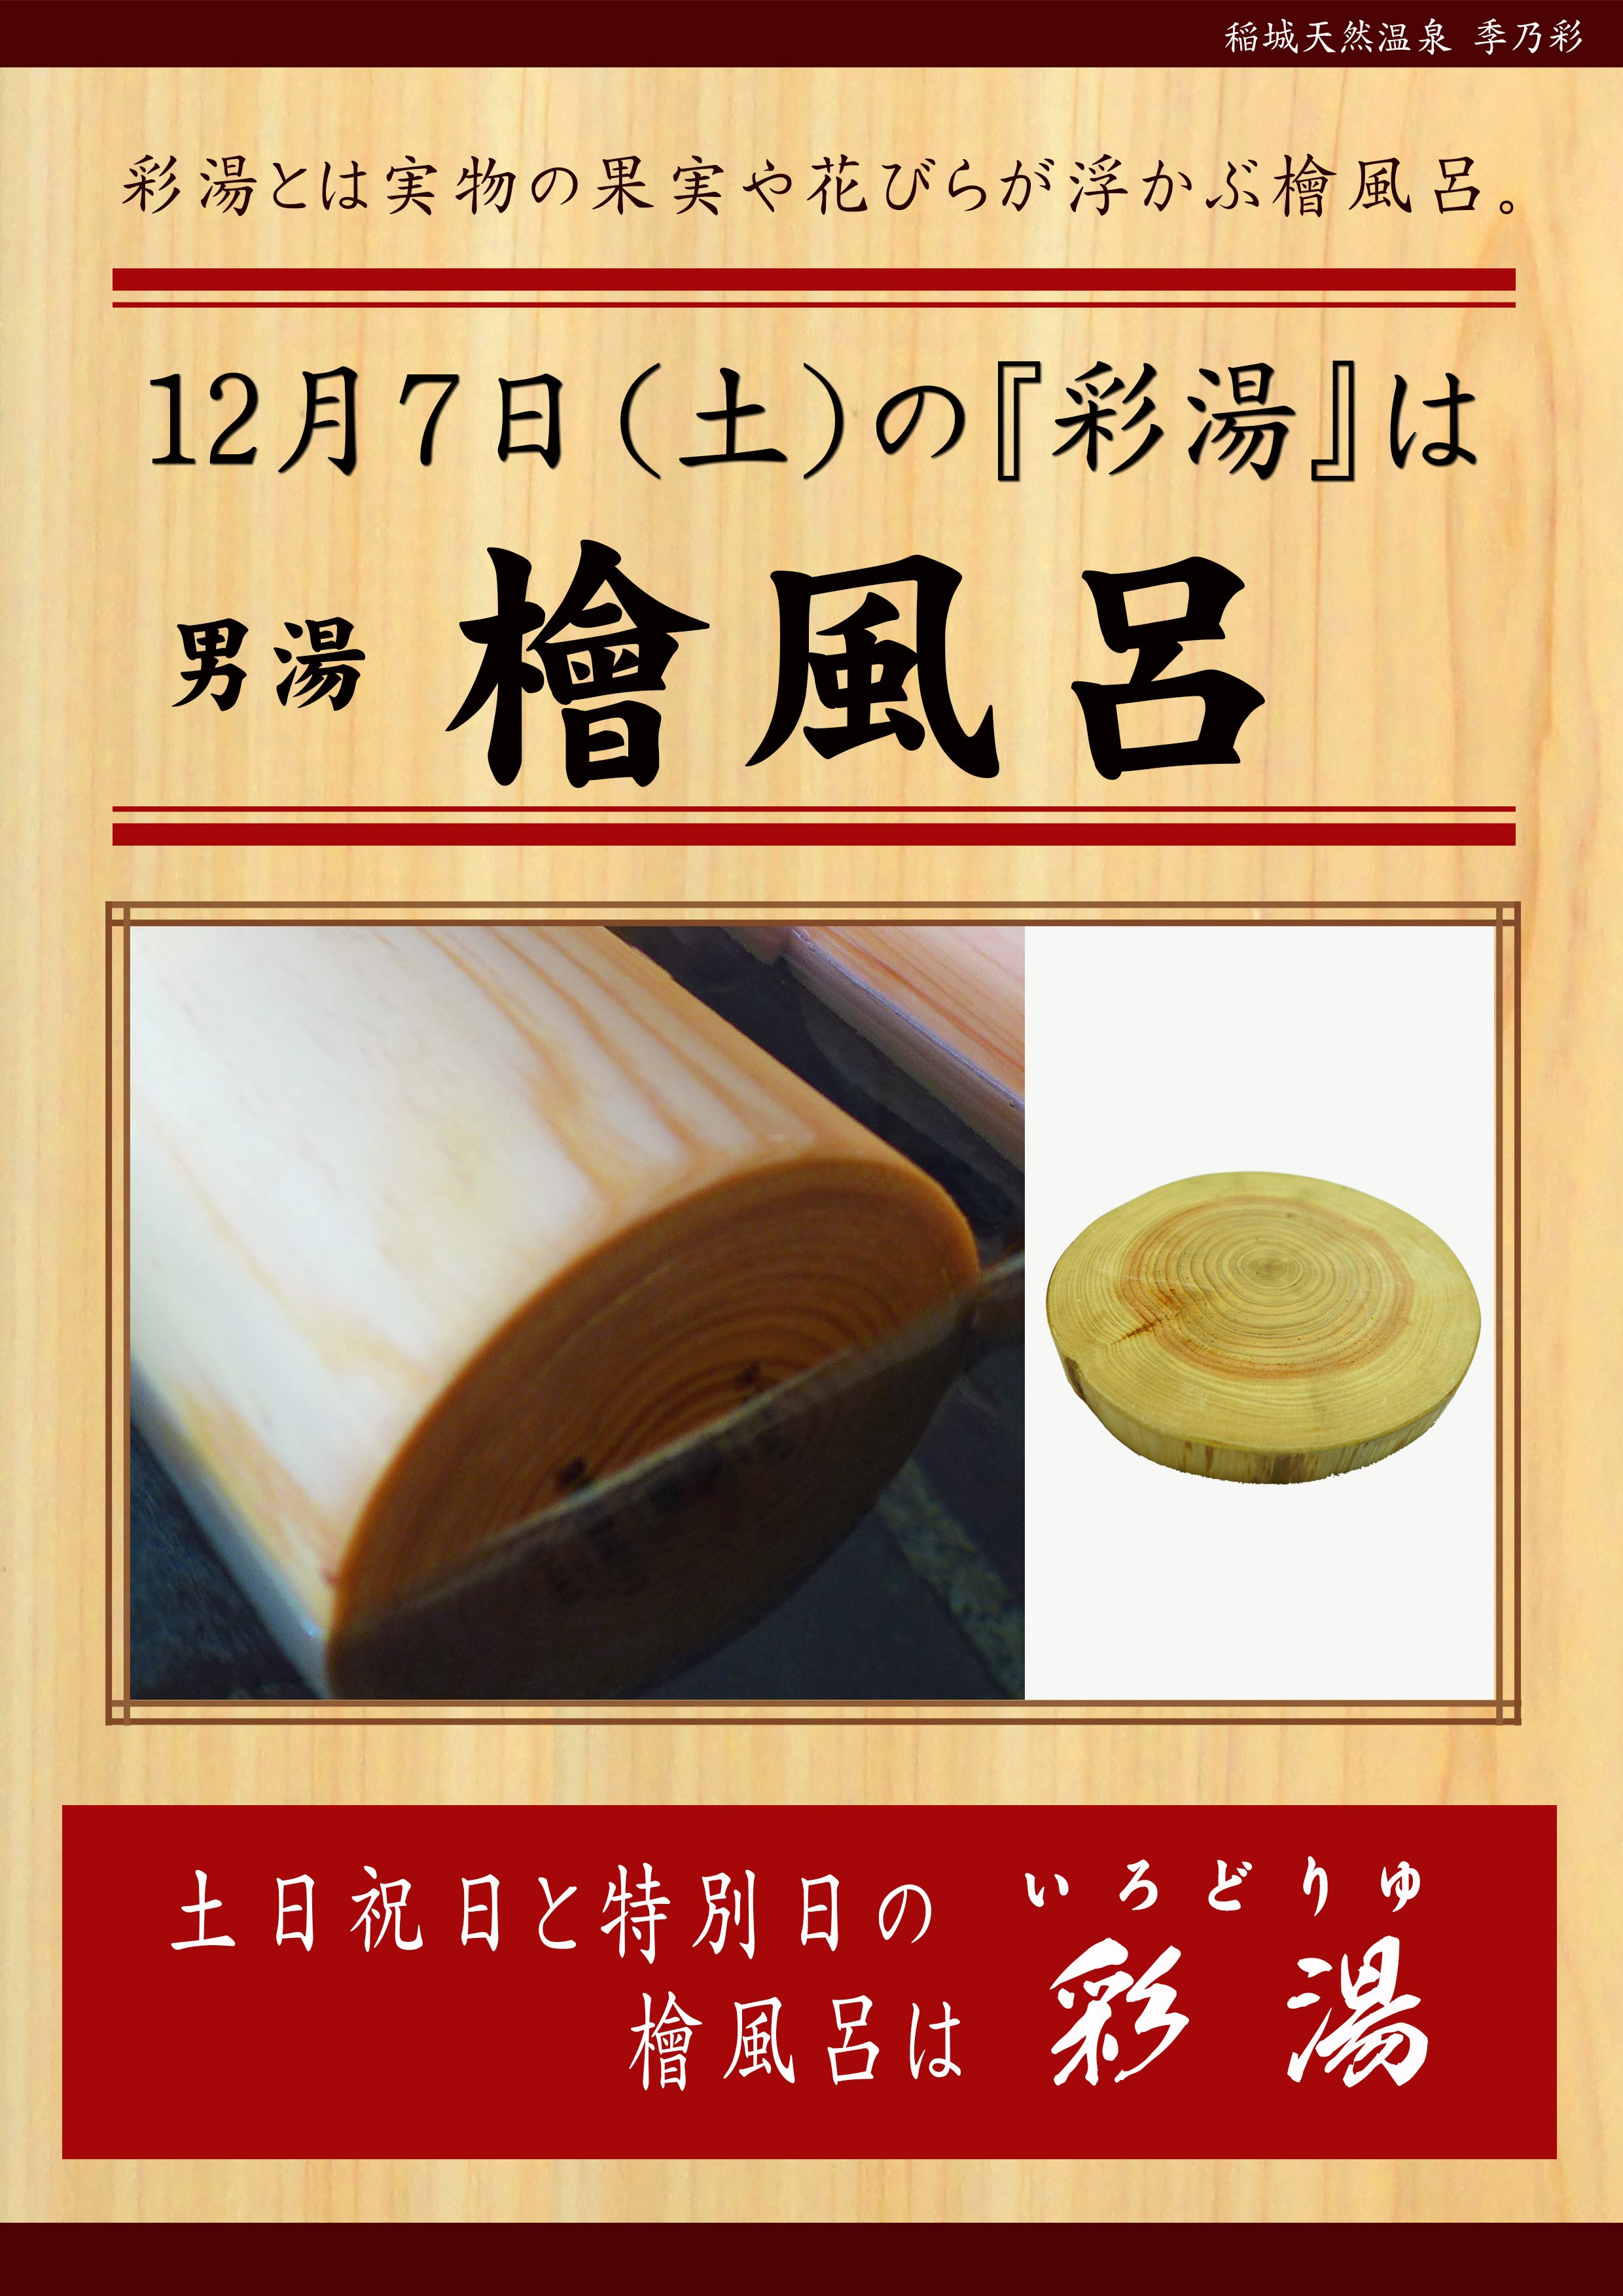 POP イベント 彩湯 男女 檜風呂